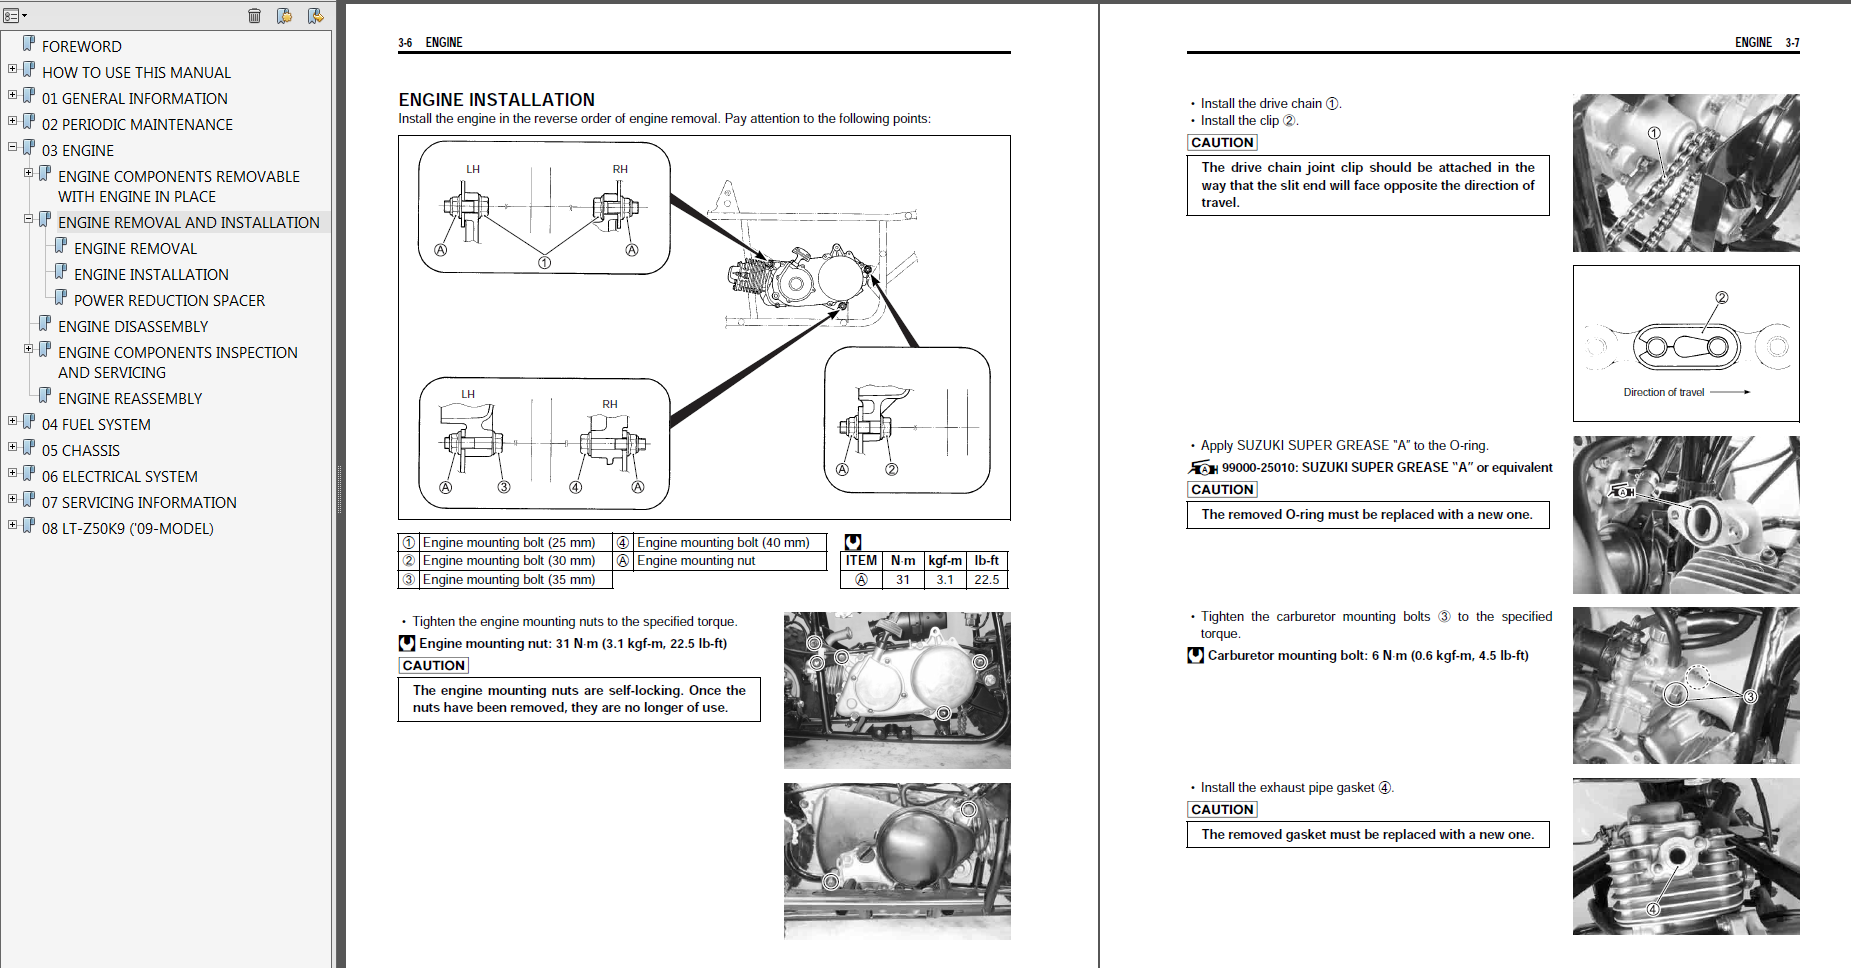 Hensim 50cc Atv Manual Guide Example 2018 Wiring Diagram Polaris 50 Get Free Image About 49cc Service